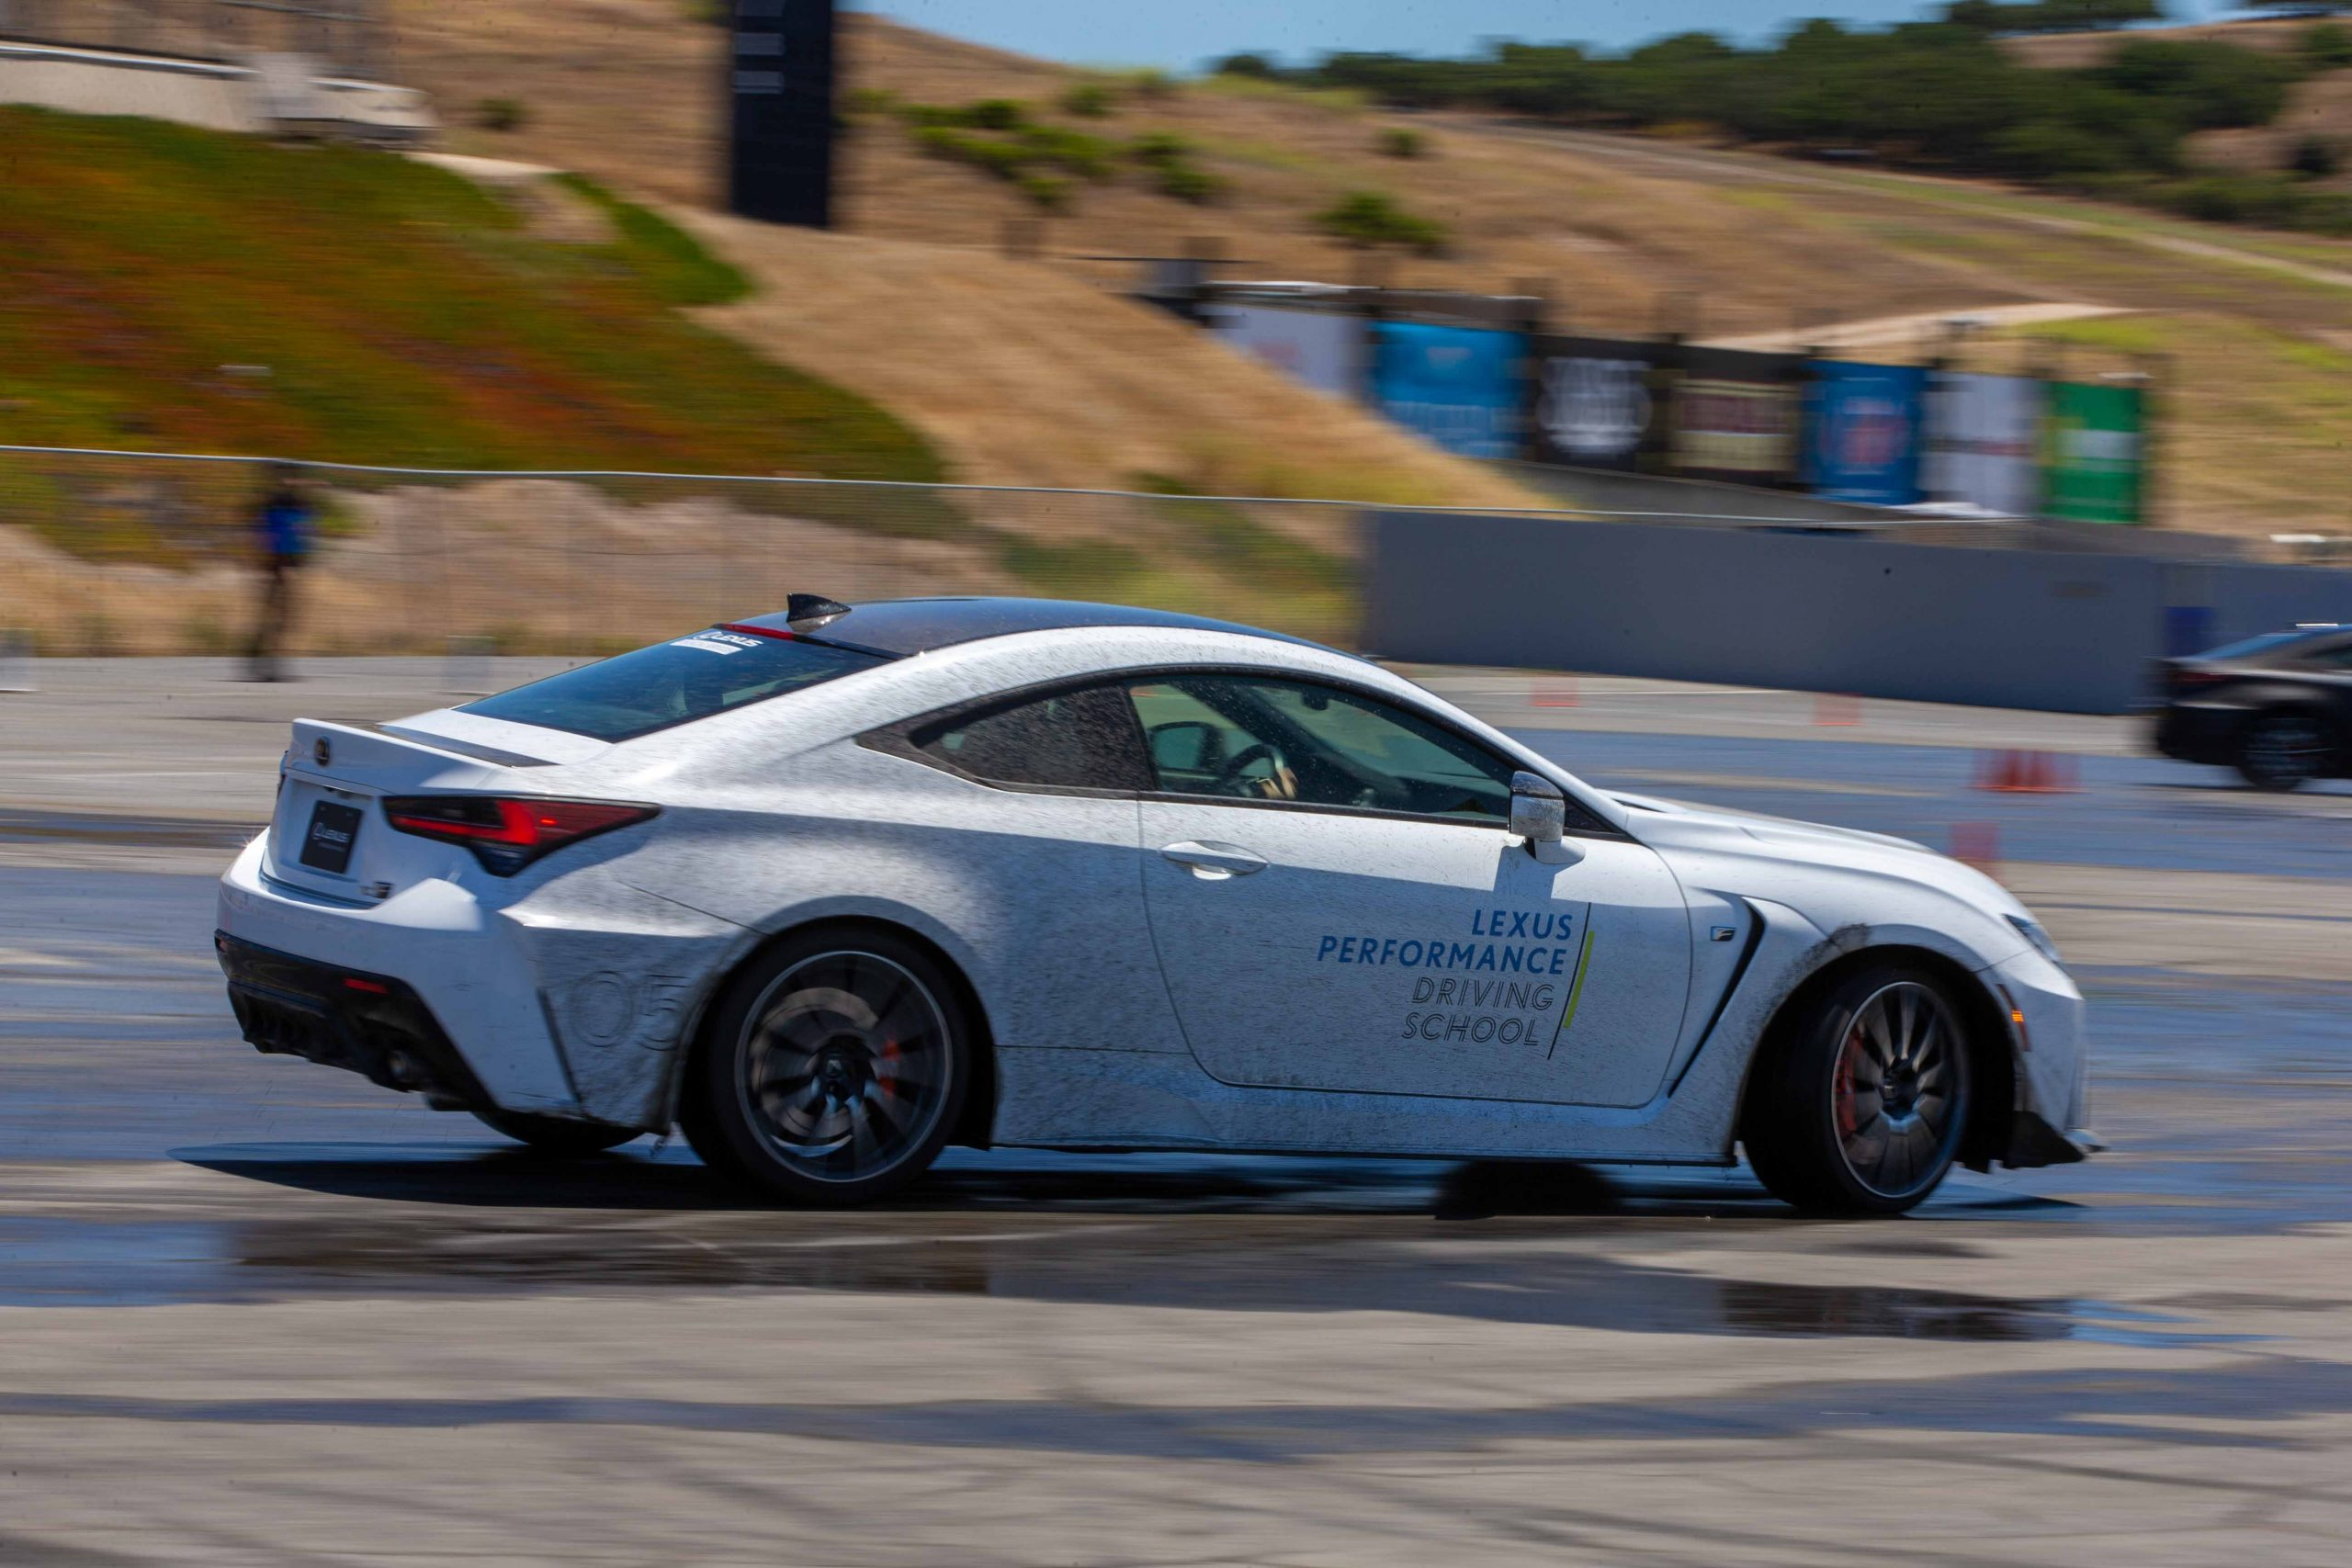 skidpad Lexus Performance Driving School June 2021 Laguna Seca